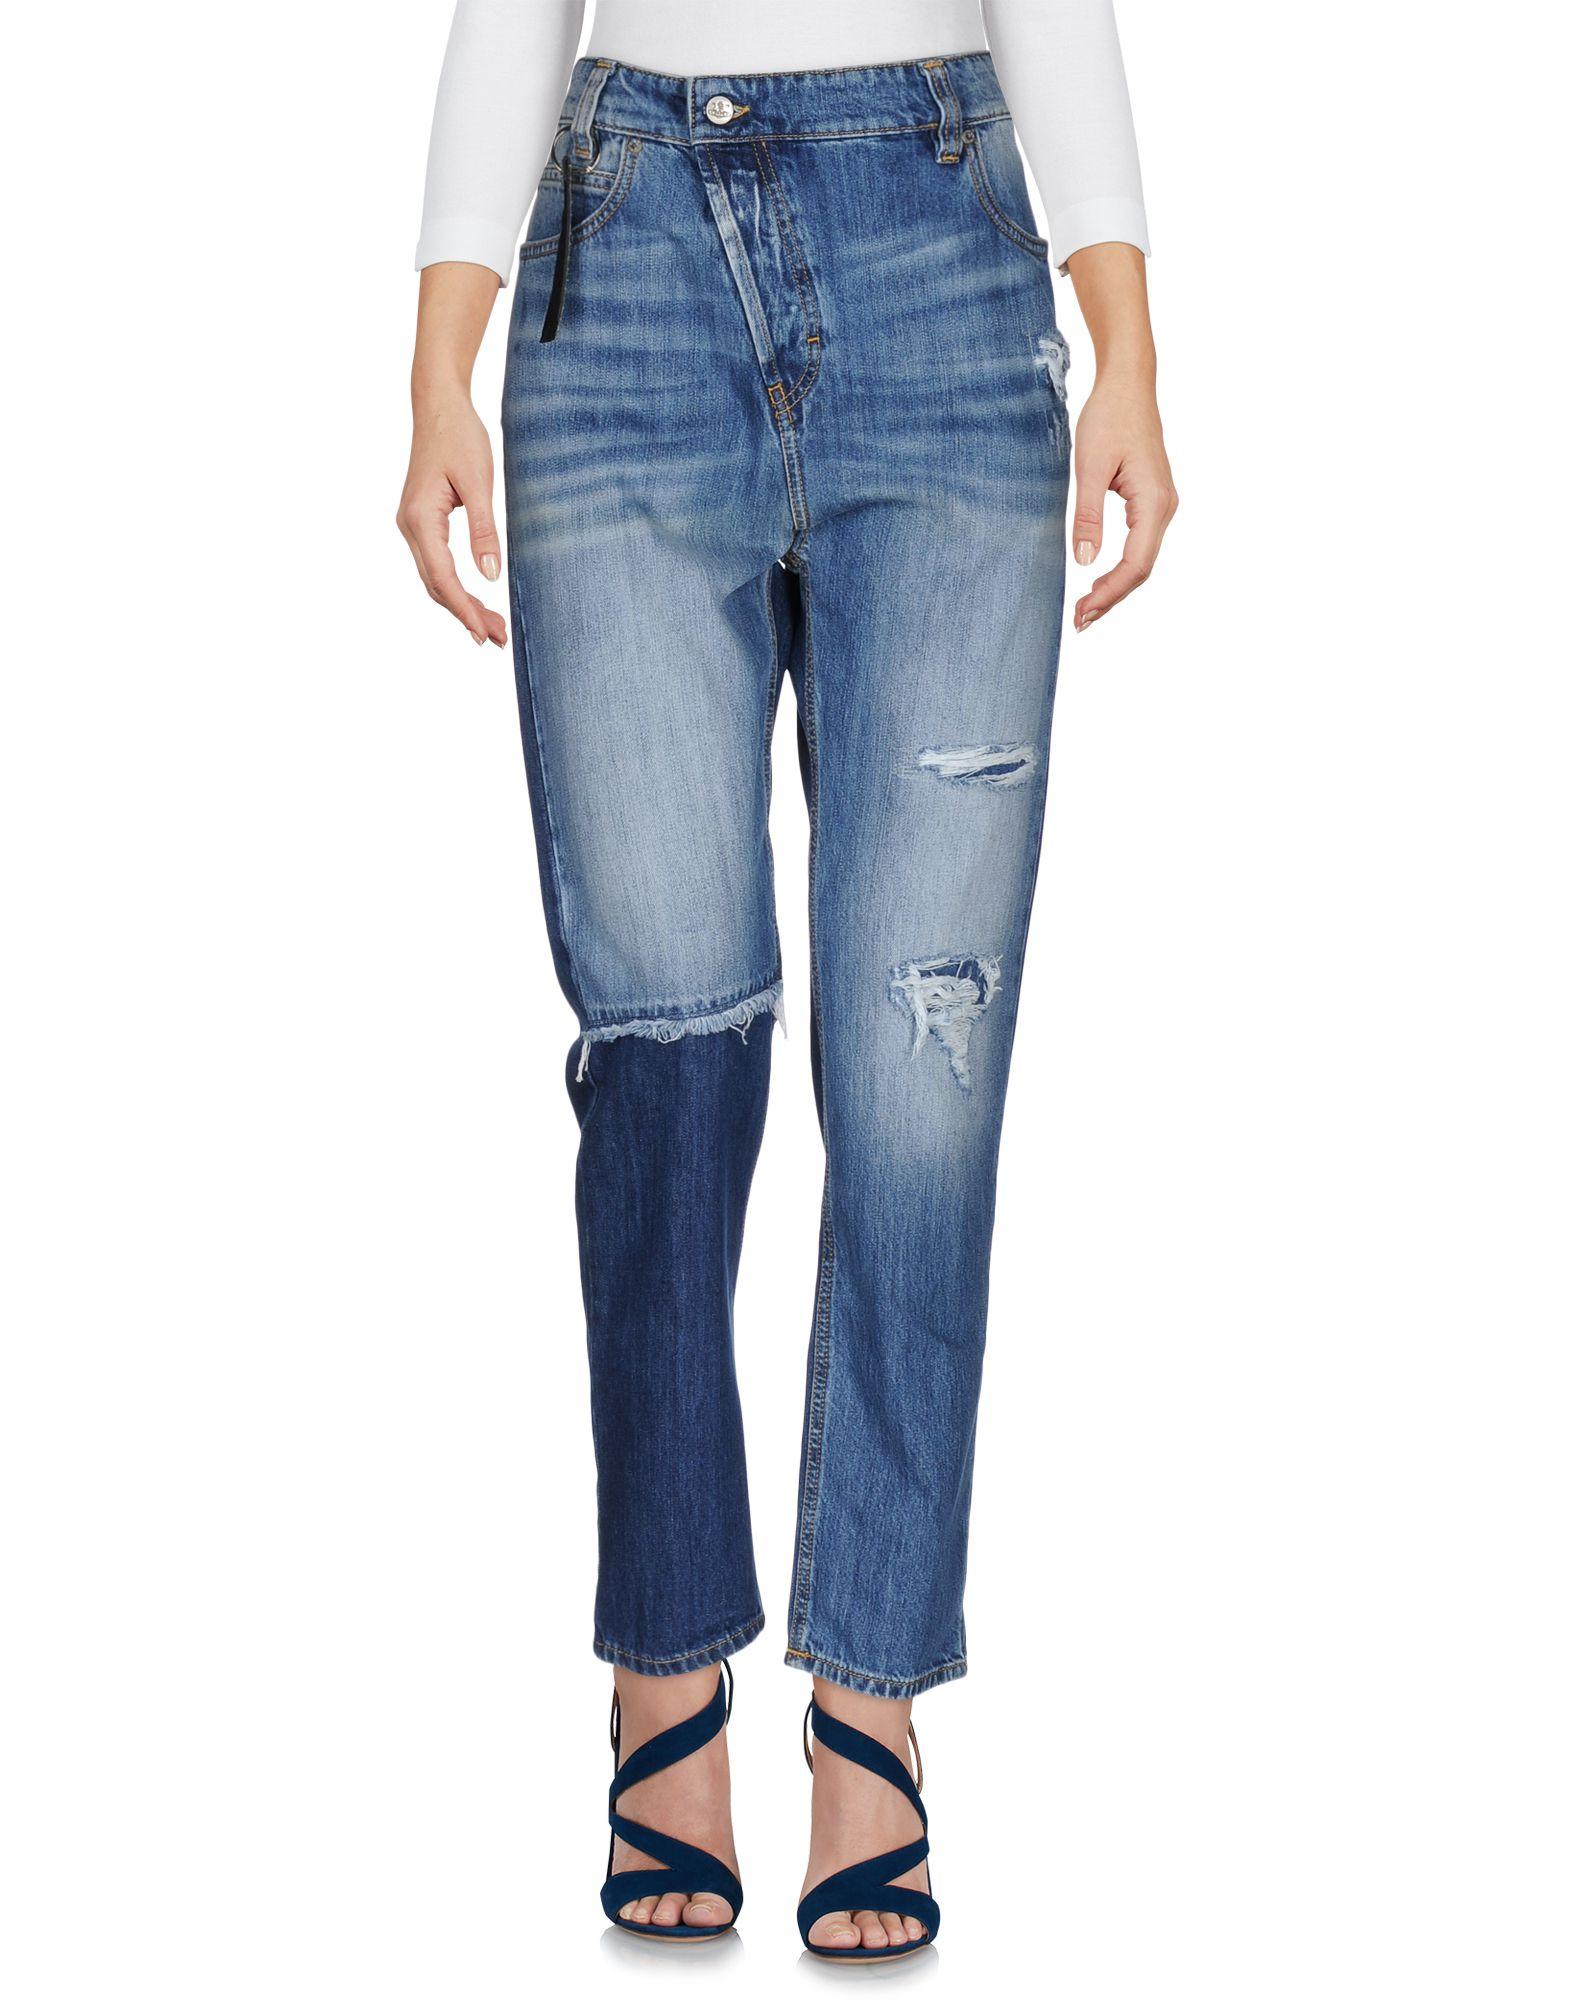 VIVIENNE WESTWOOD ANGLOMANIA Damen Jeanshose Farbe Blau Größe 6 - broschei